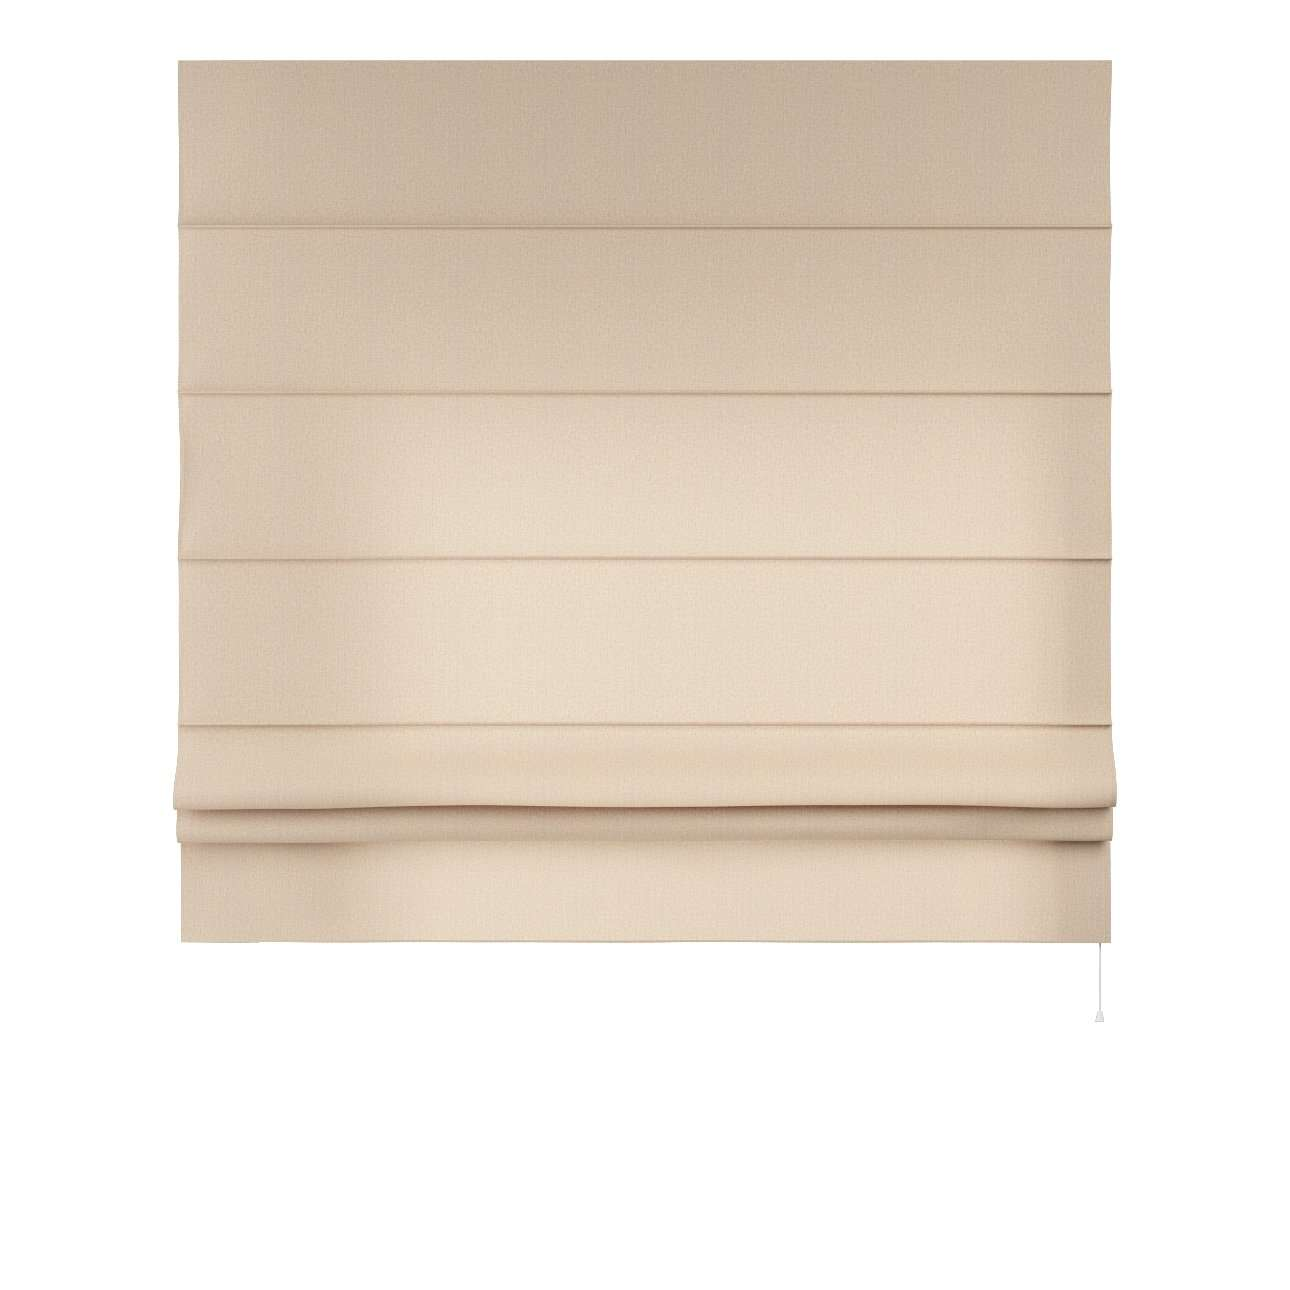 Padva roman blind  80 x 170 cm (31.5 x 67 inch) in collection Edinburgh , fabric: 115-78